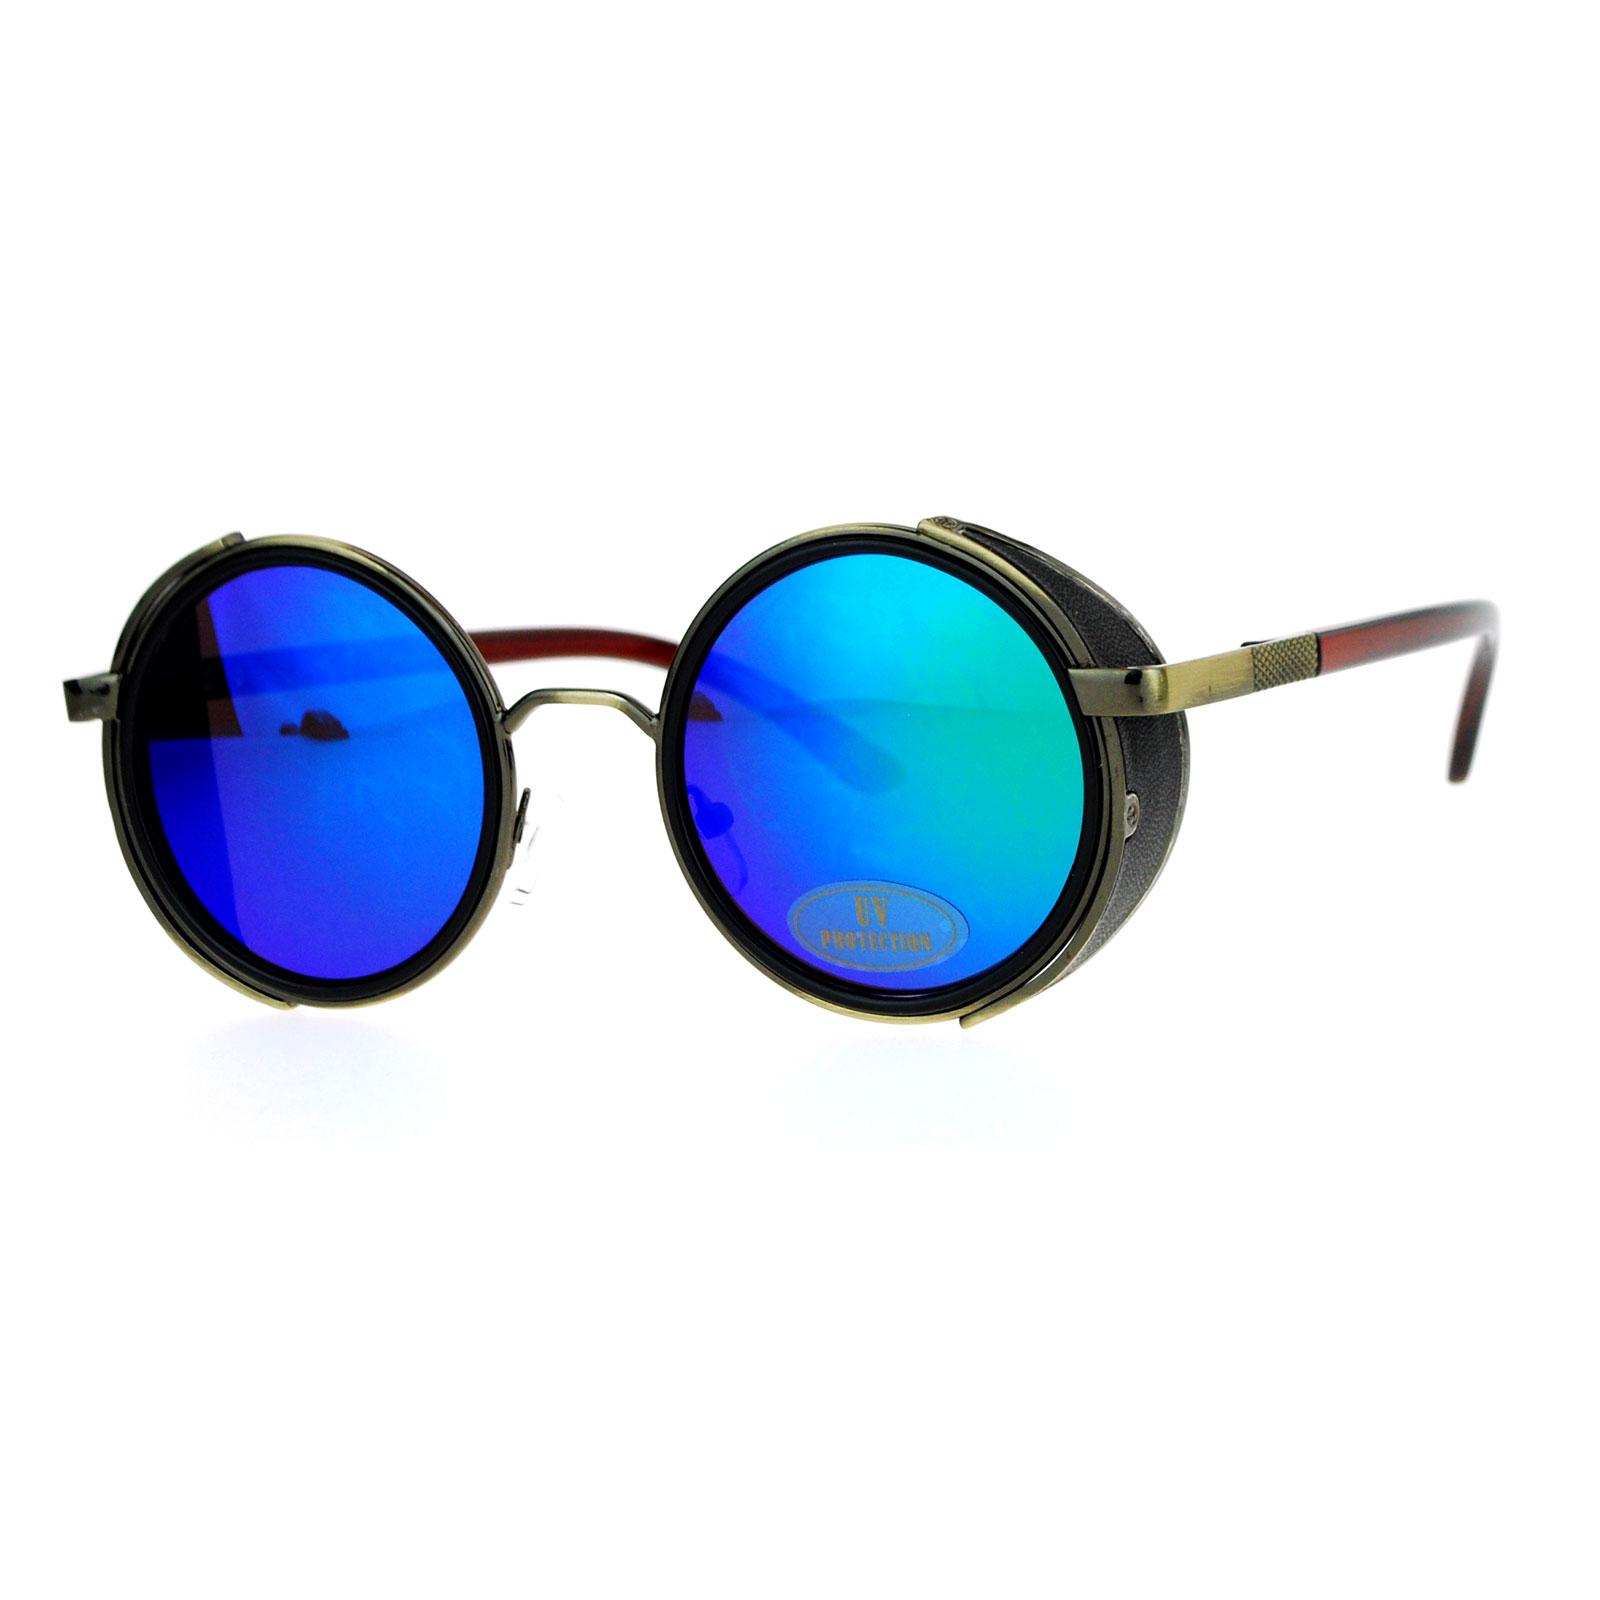 Round Circle Sunglasses  sa106 steampunk victorian side visor round circle lens sunglasses